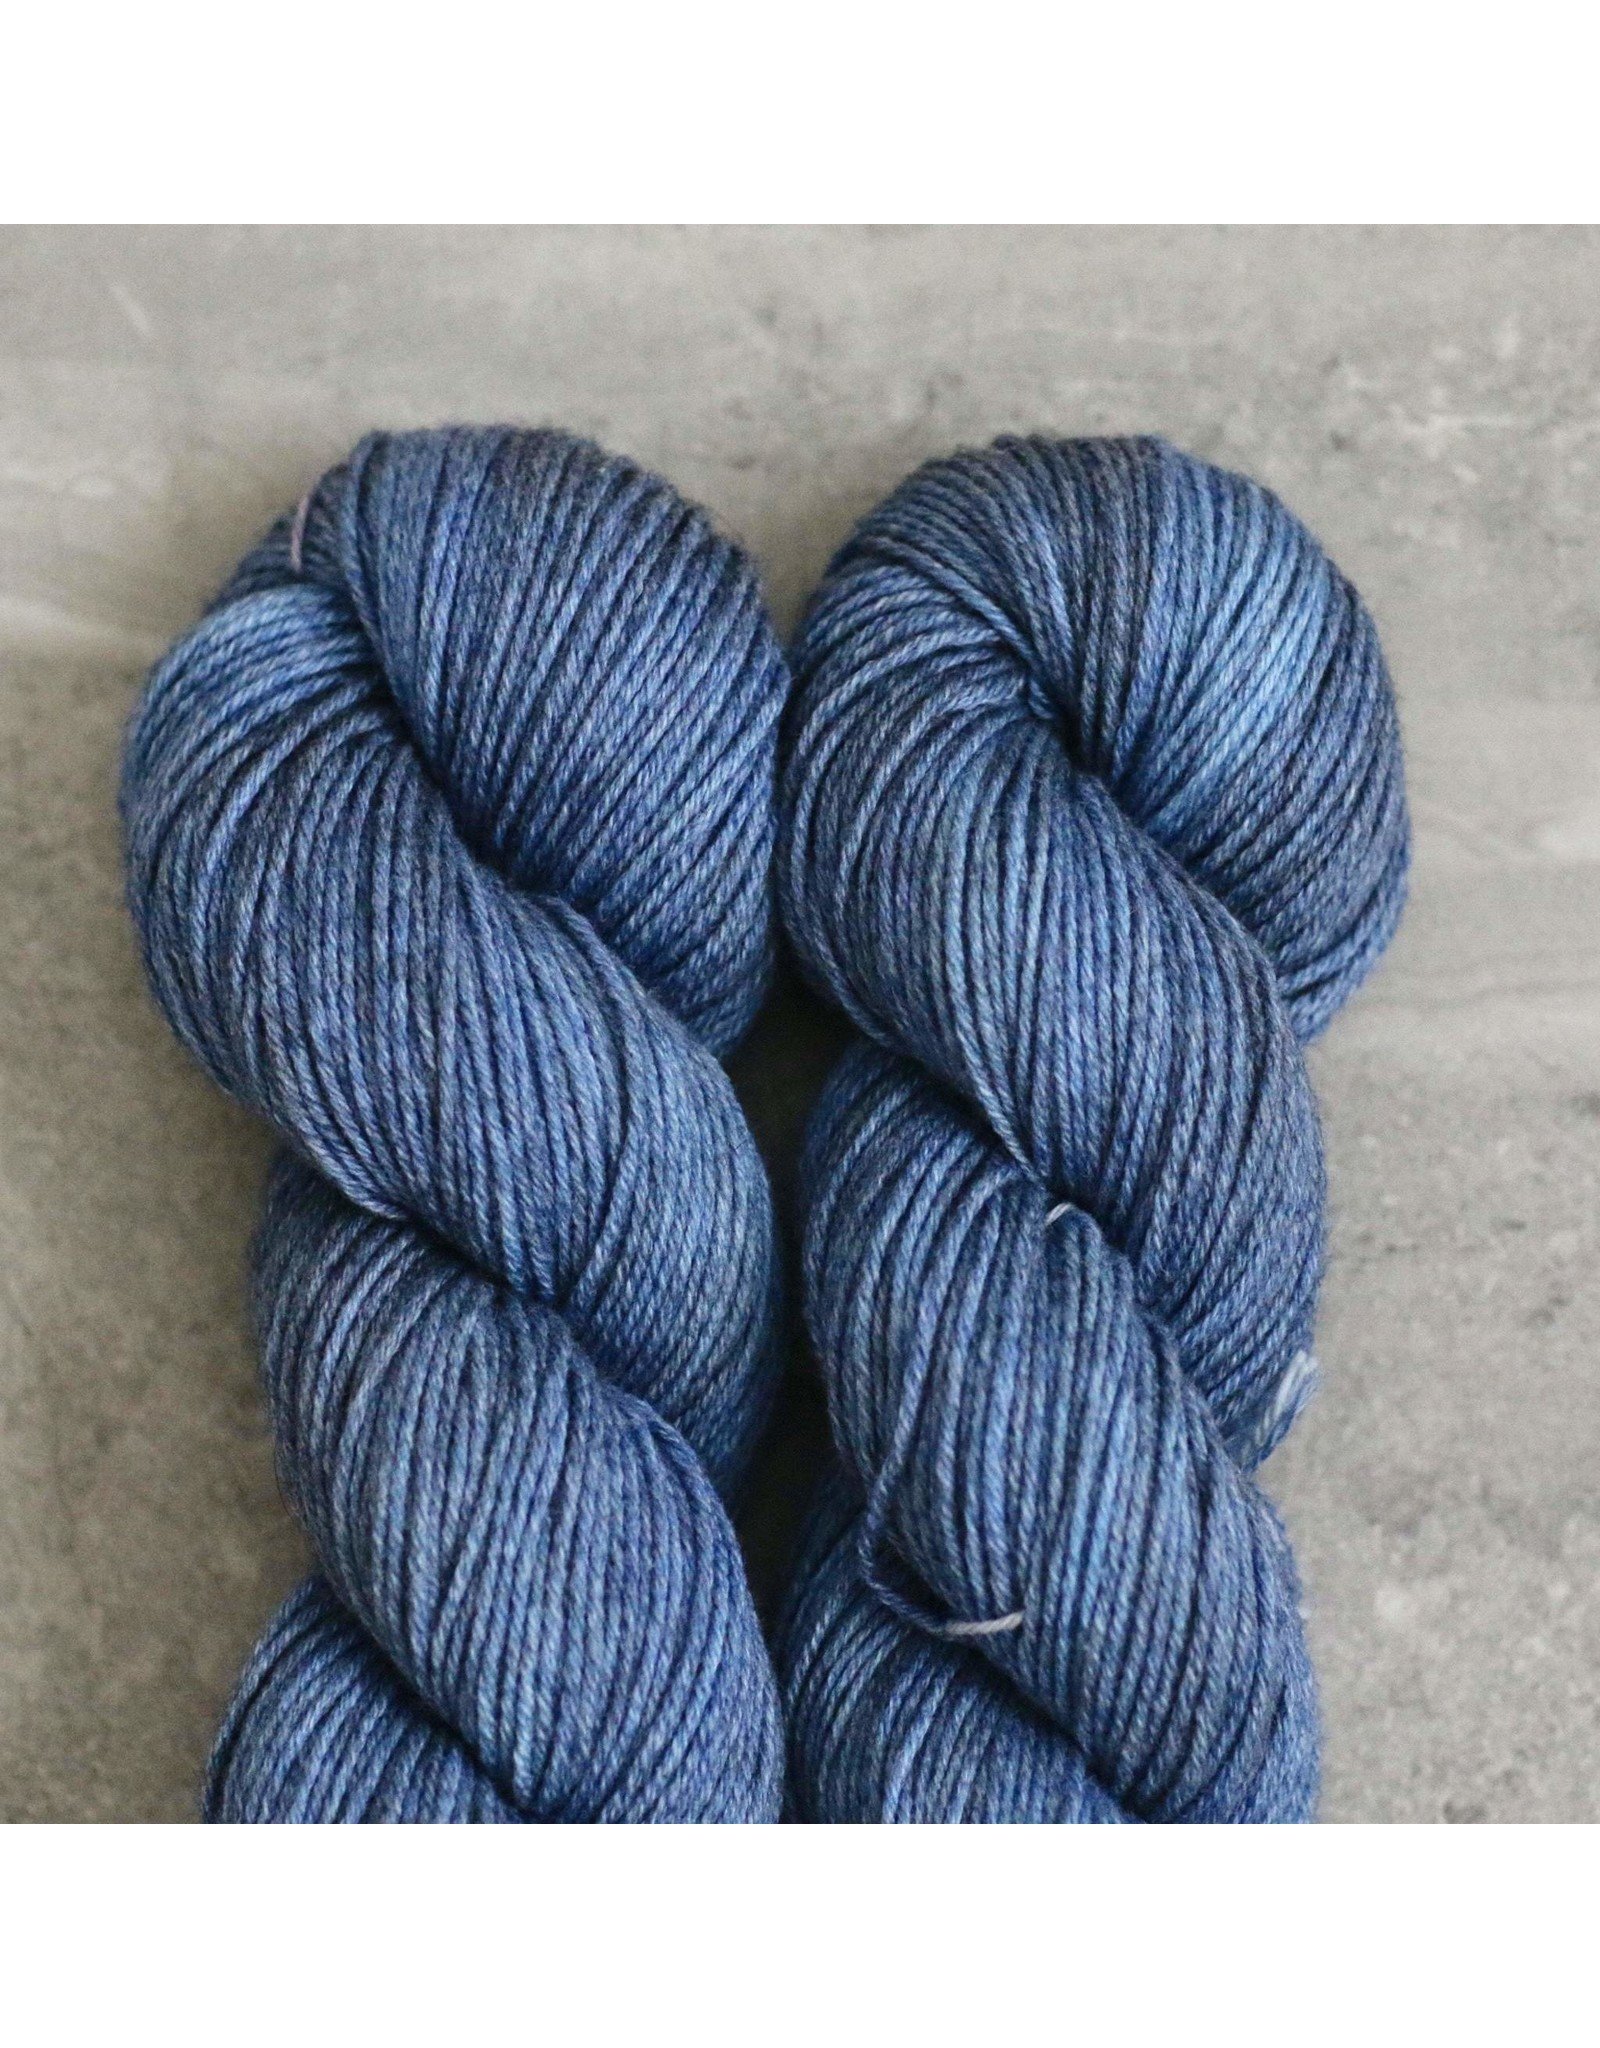 Arctic - Tosh Wool + Cotton - Madelinetosh